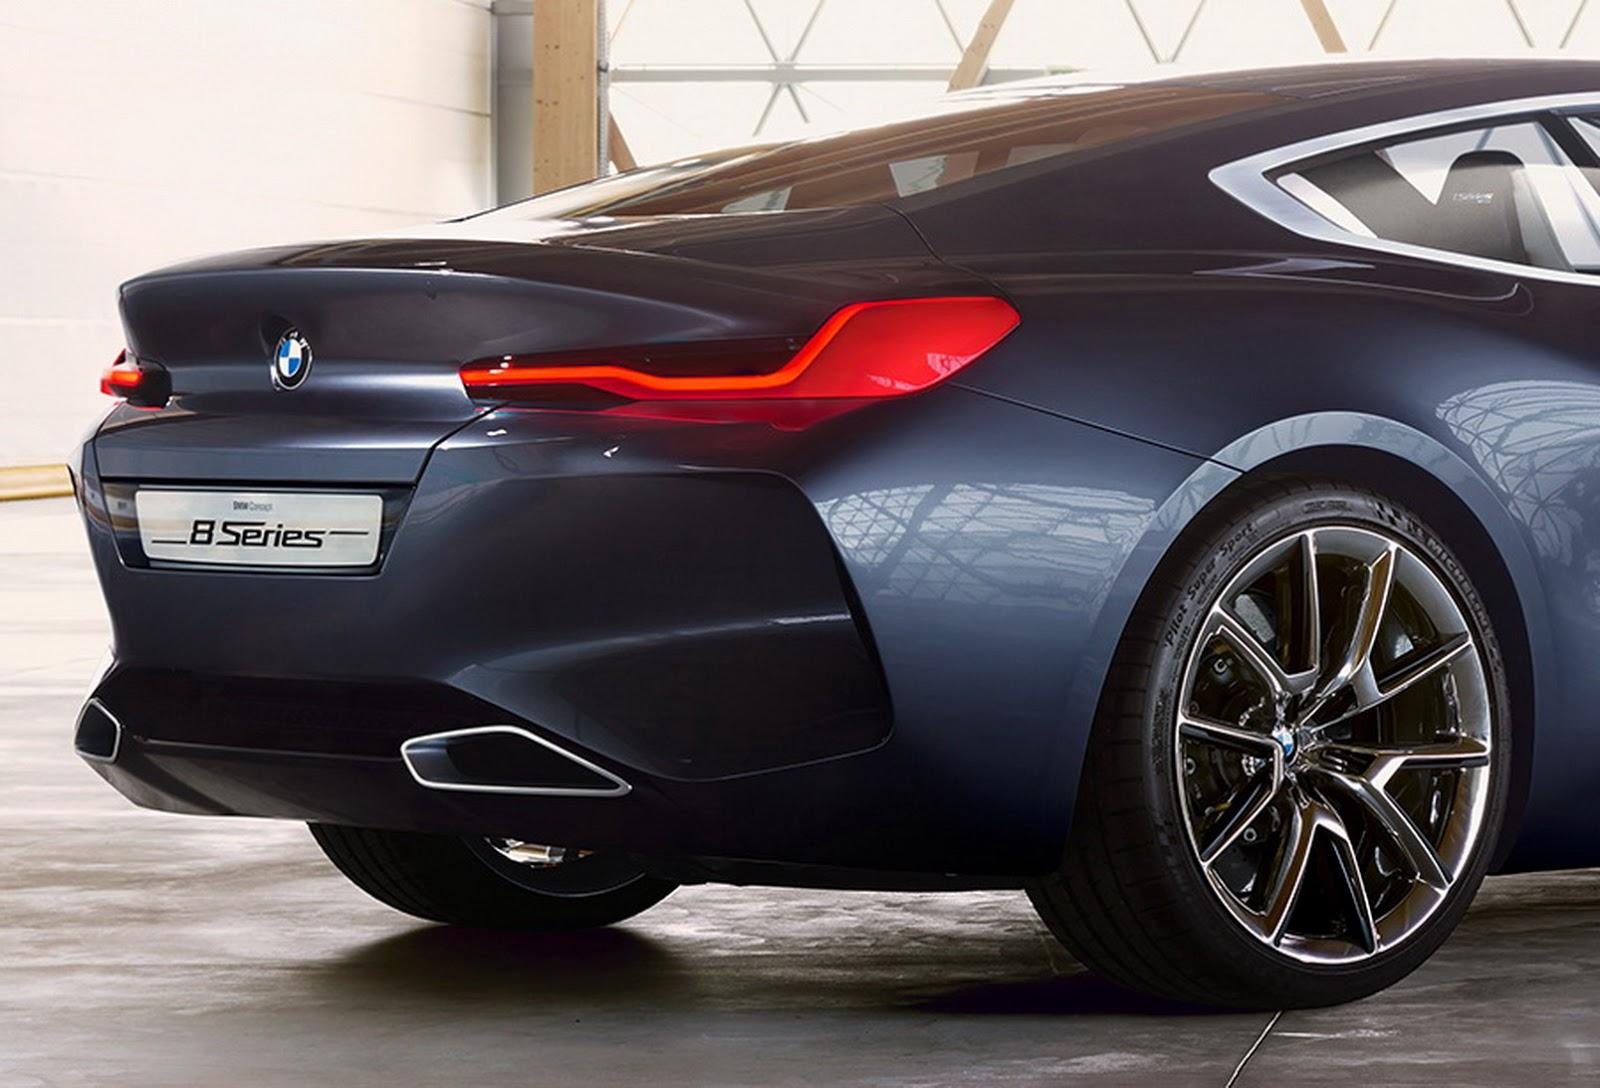 BMW_Concept_8_Series_01